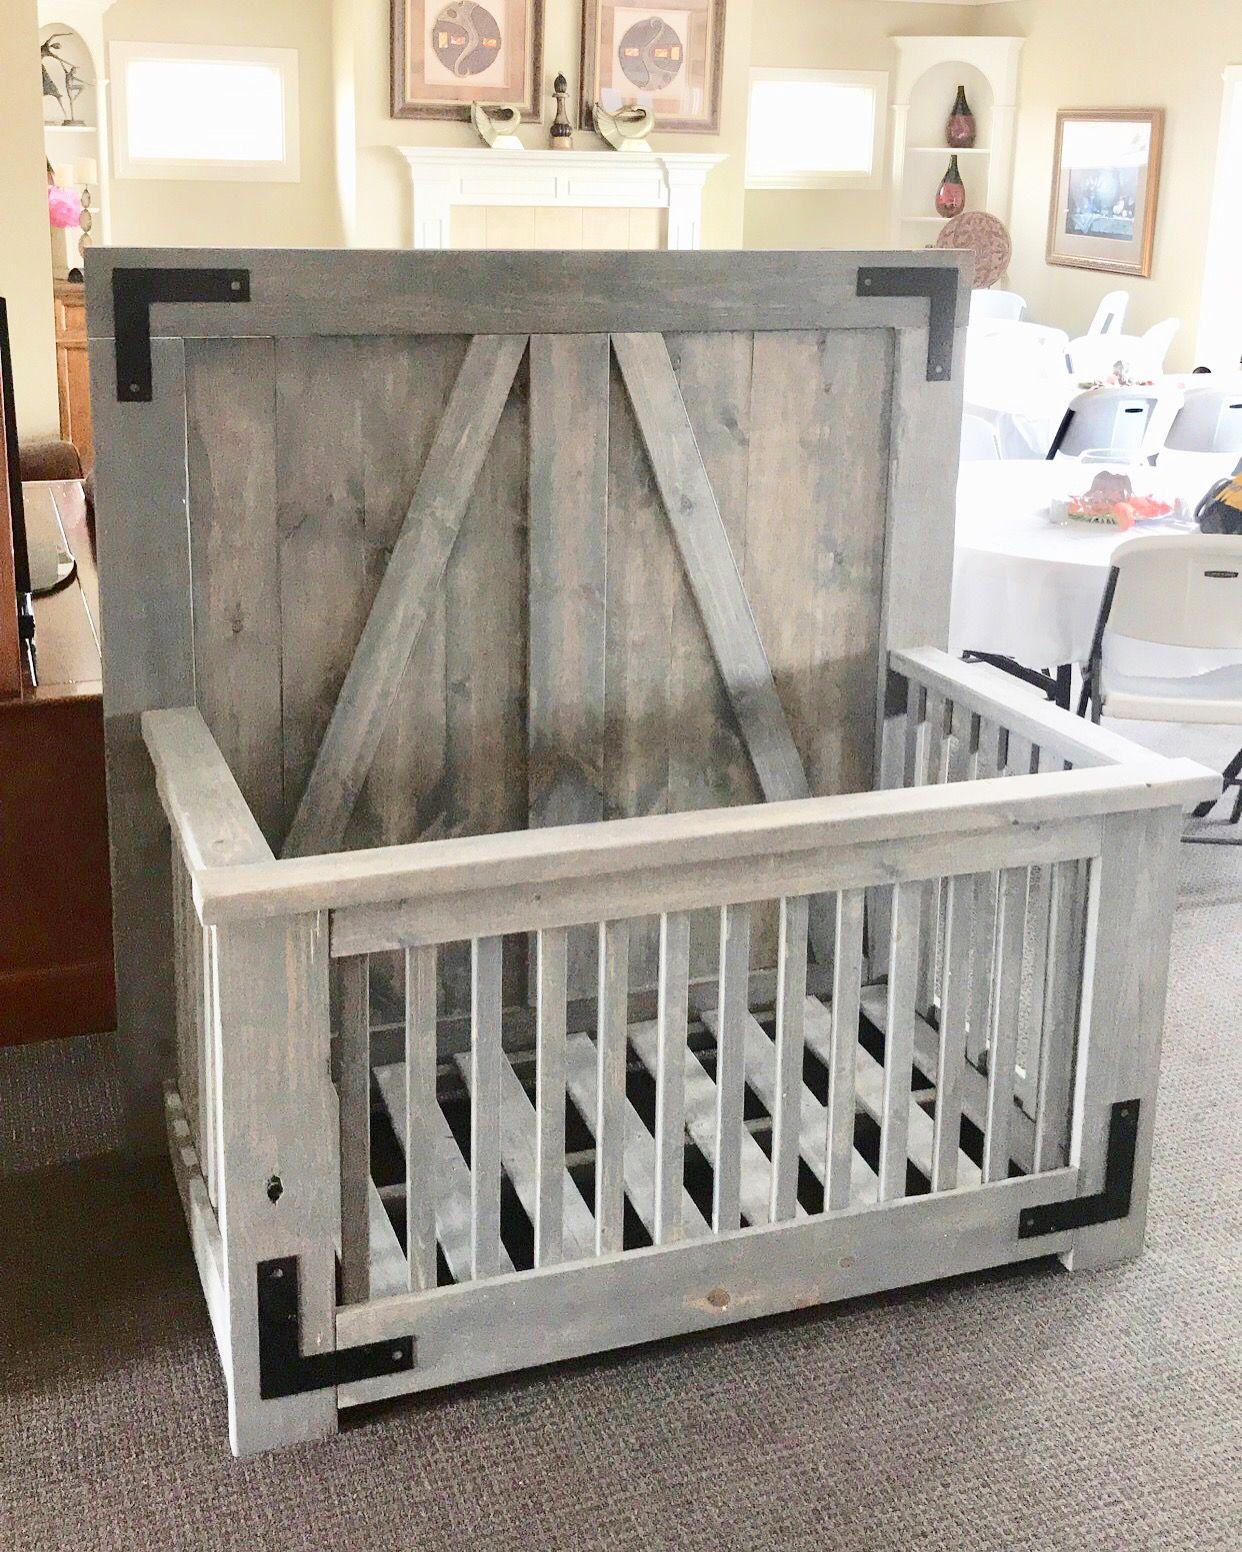 Farmhouse style Baby Crib! Nice gray finish with black ...